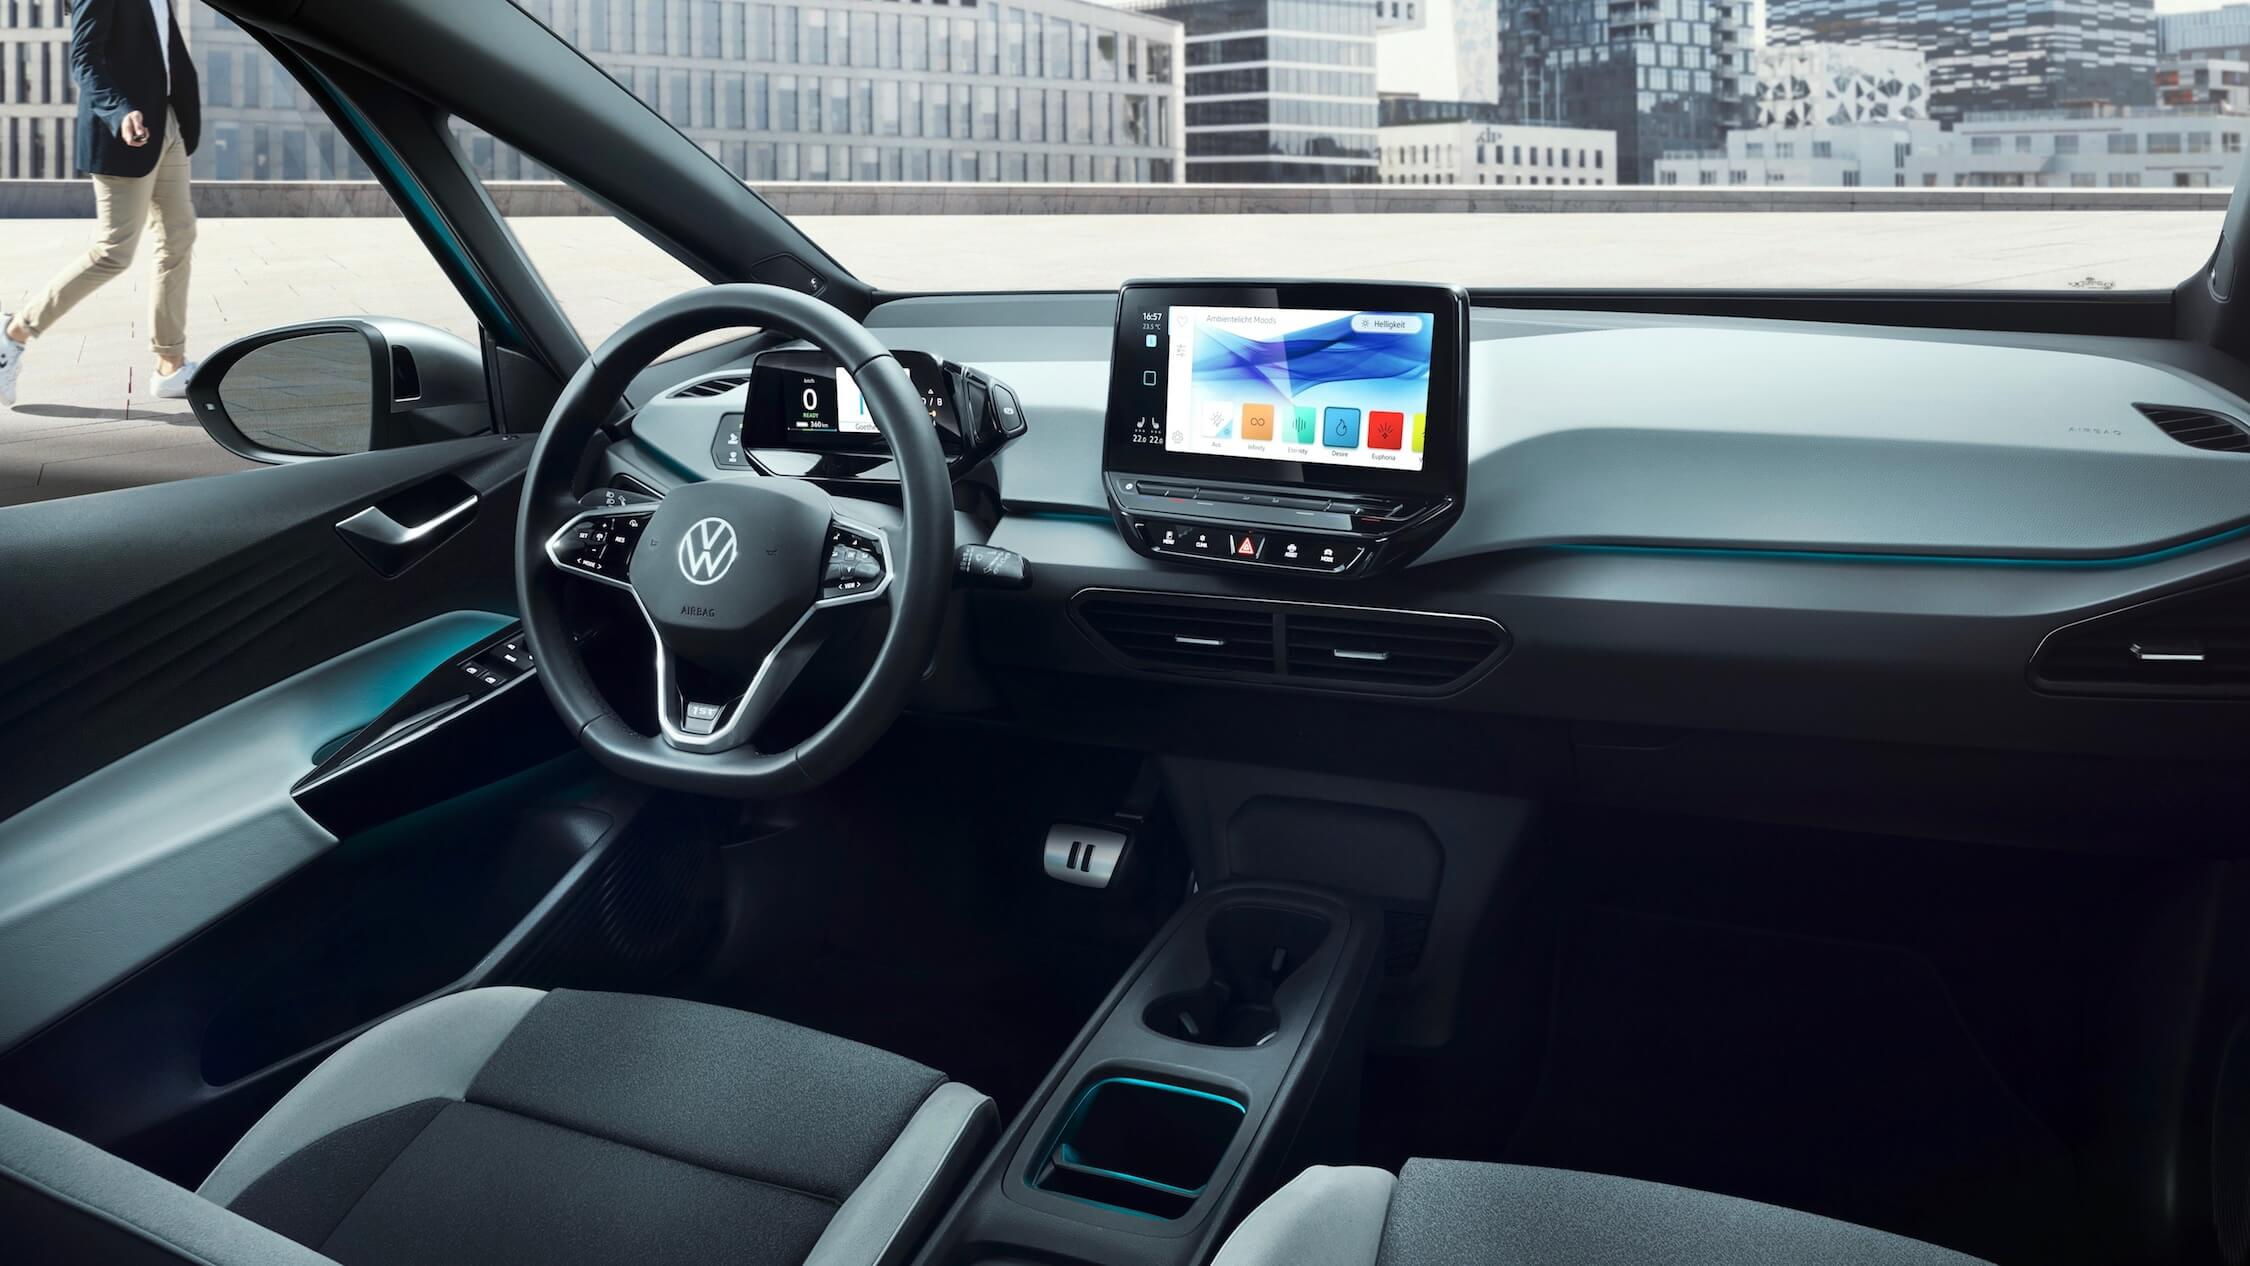 Volkswagen ID 3 dashboard